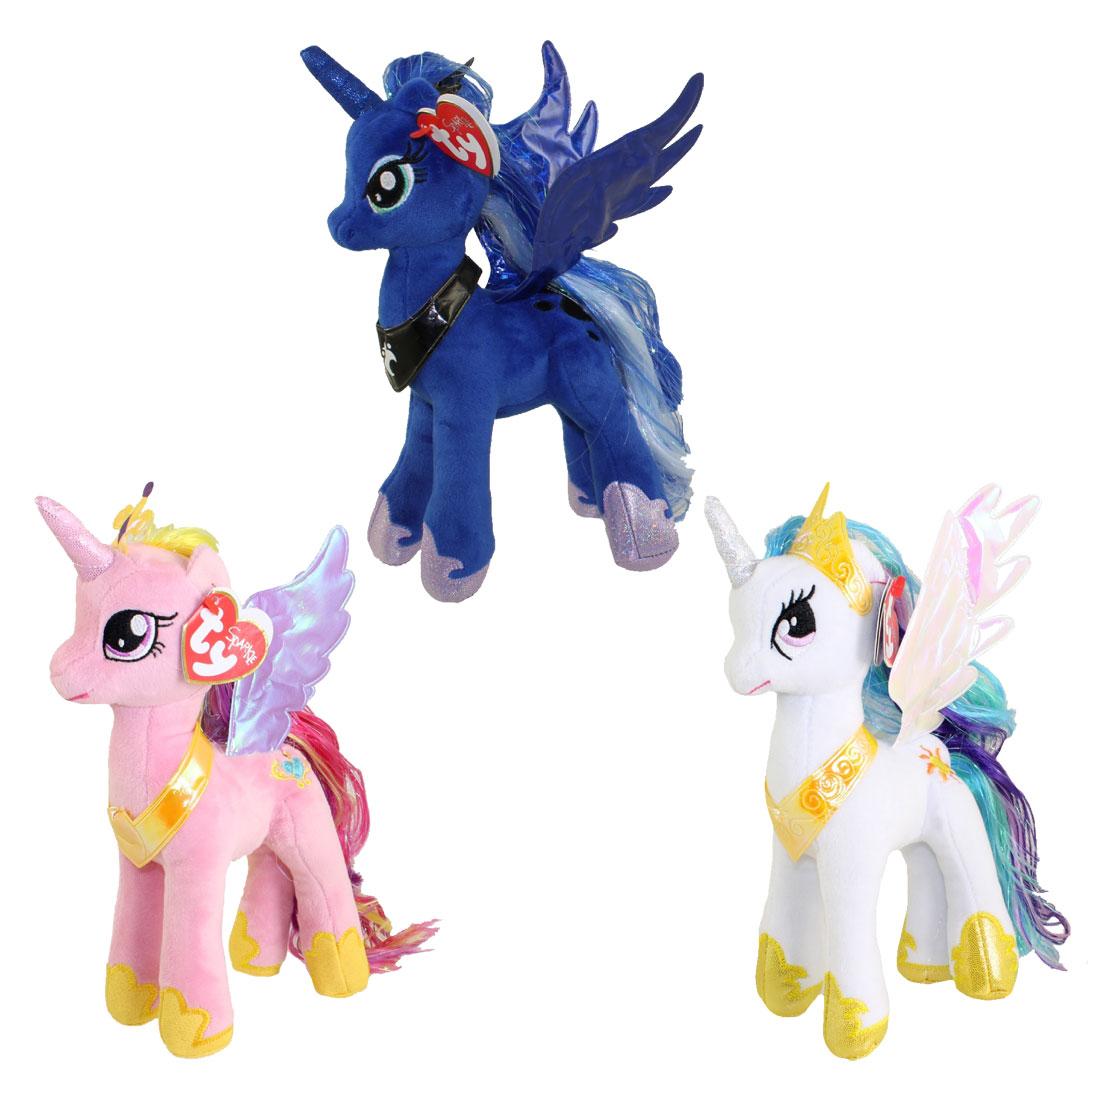 Ty Beanie Babies My Little Pony Set Of 3 Princess